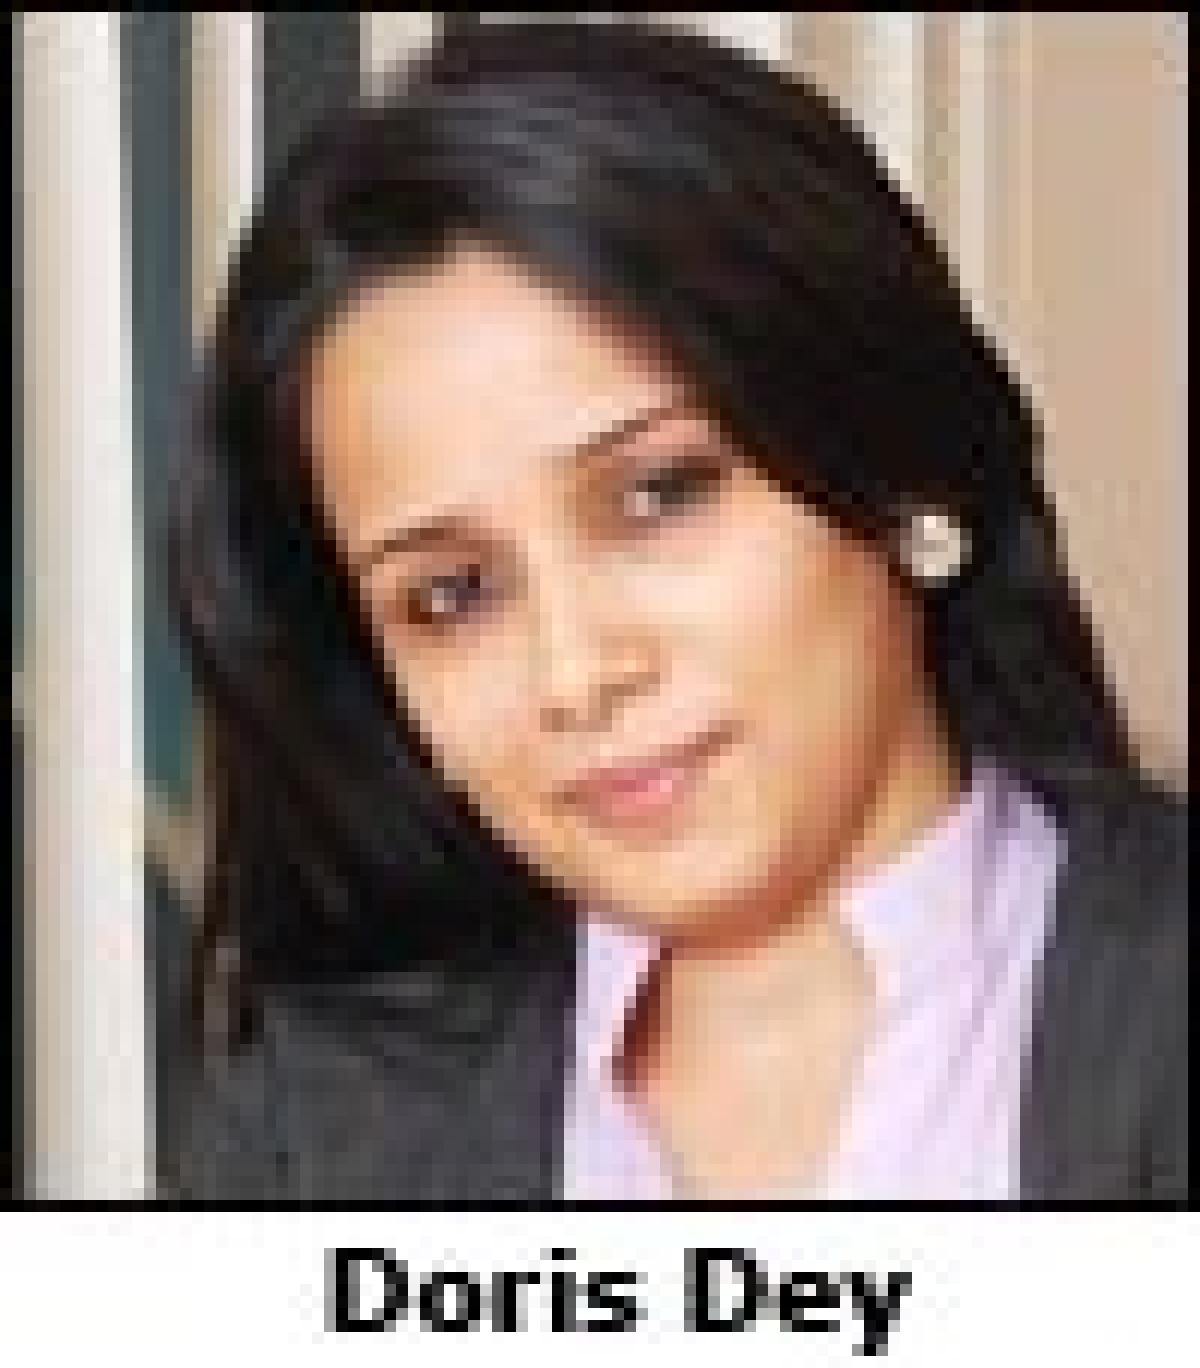 Endemol India appoints Abhishek Rege to head TV; Doris Dey comes on board to head fiction